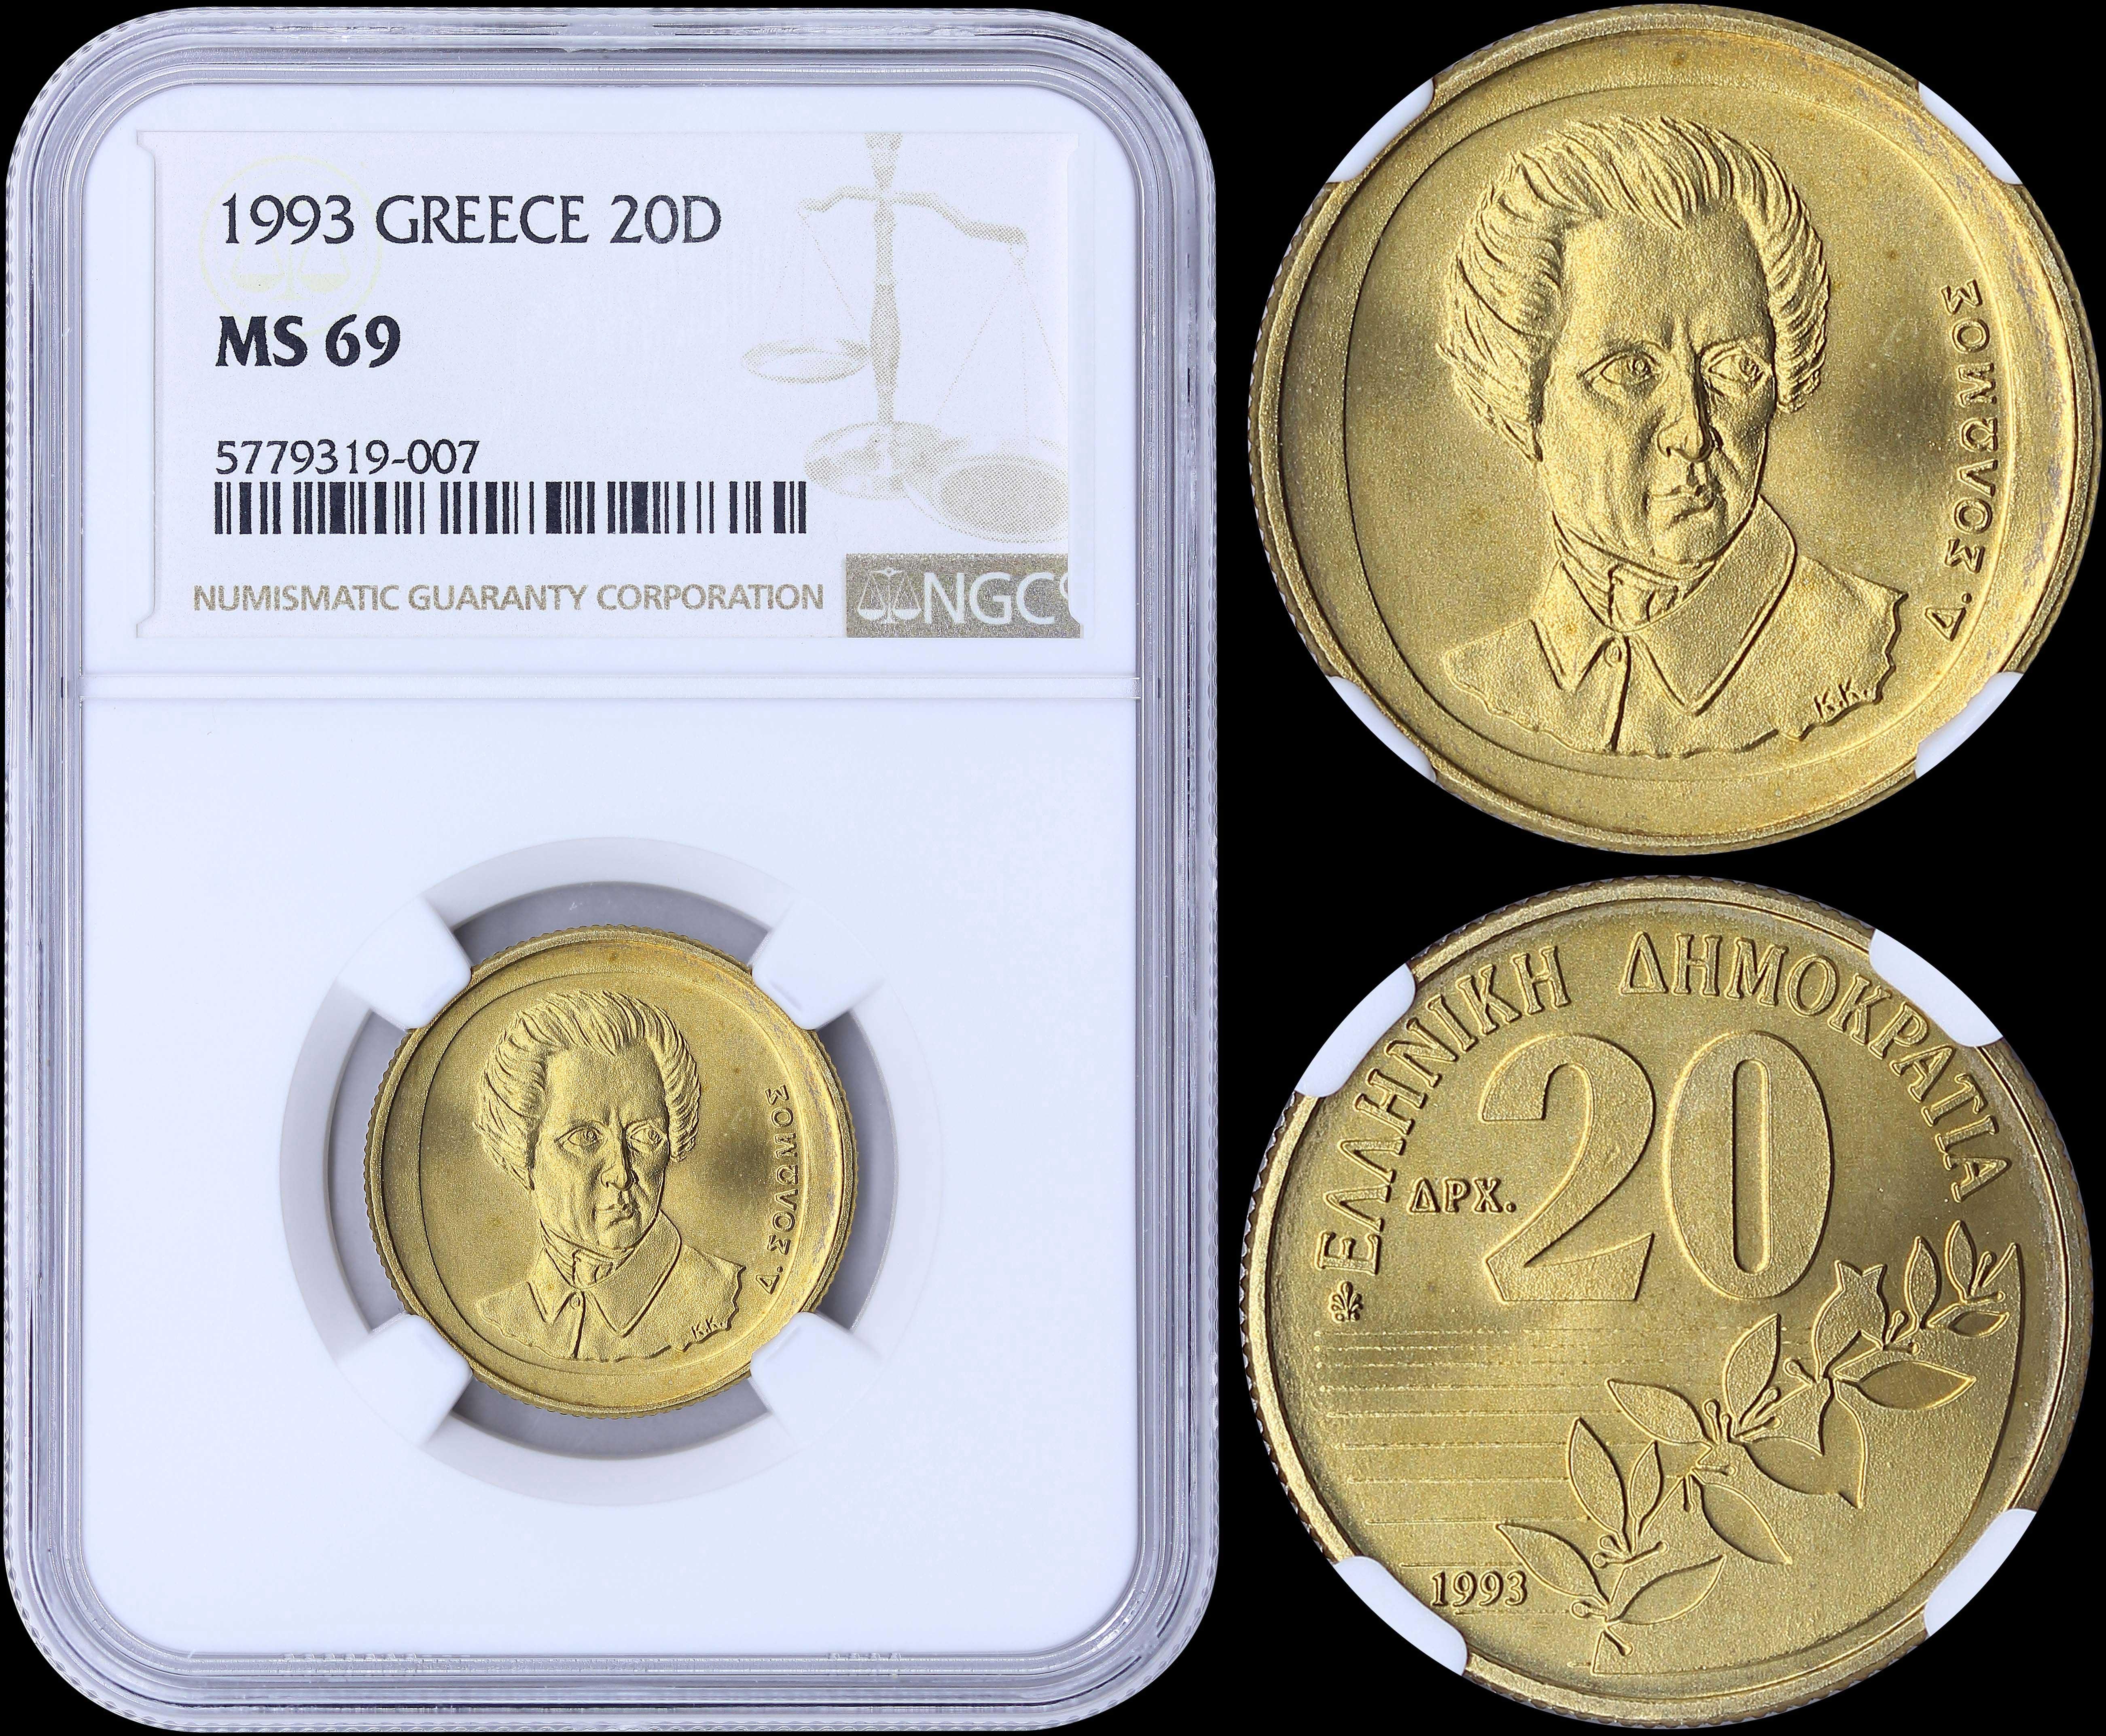 Lot 6226 - -  COINS & TOKENS HELLENIC REPUBLIC & COMMEMORATIVE ISSUES -  A. Karamitsos Public & Live Internet Auction 682 (Part A) Coins, Medals & Banknotes